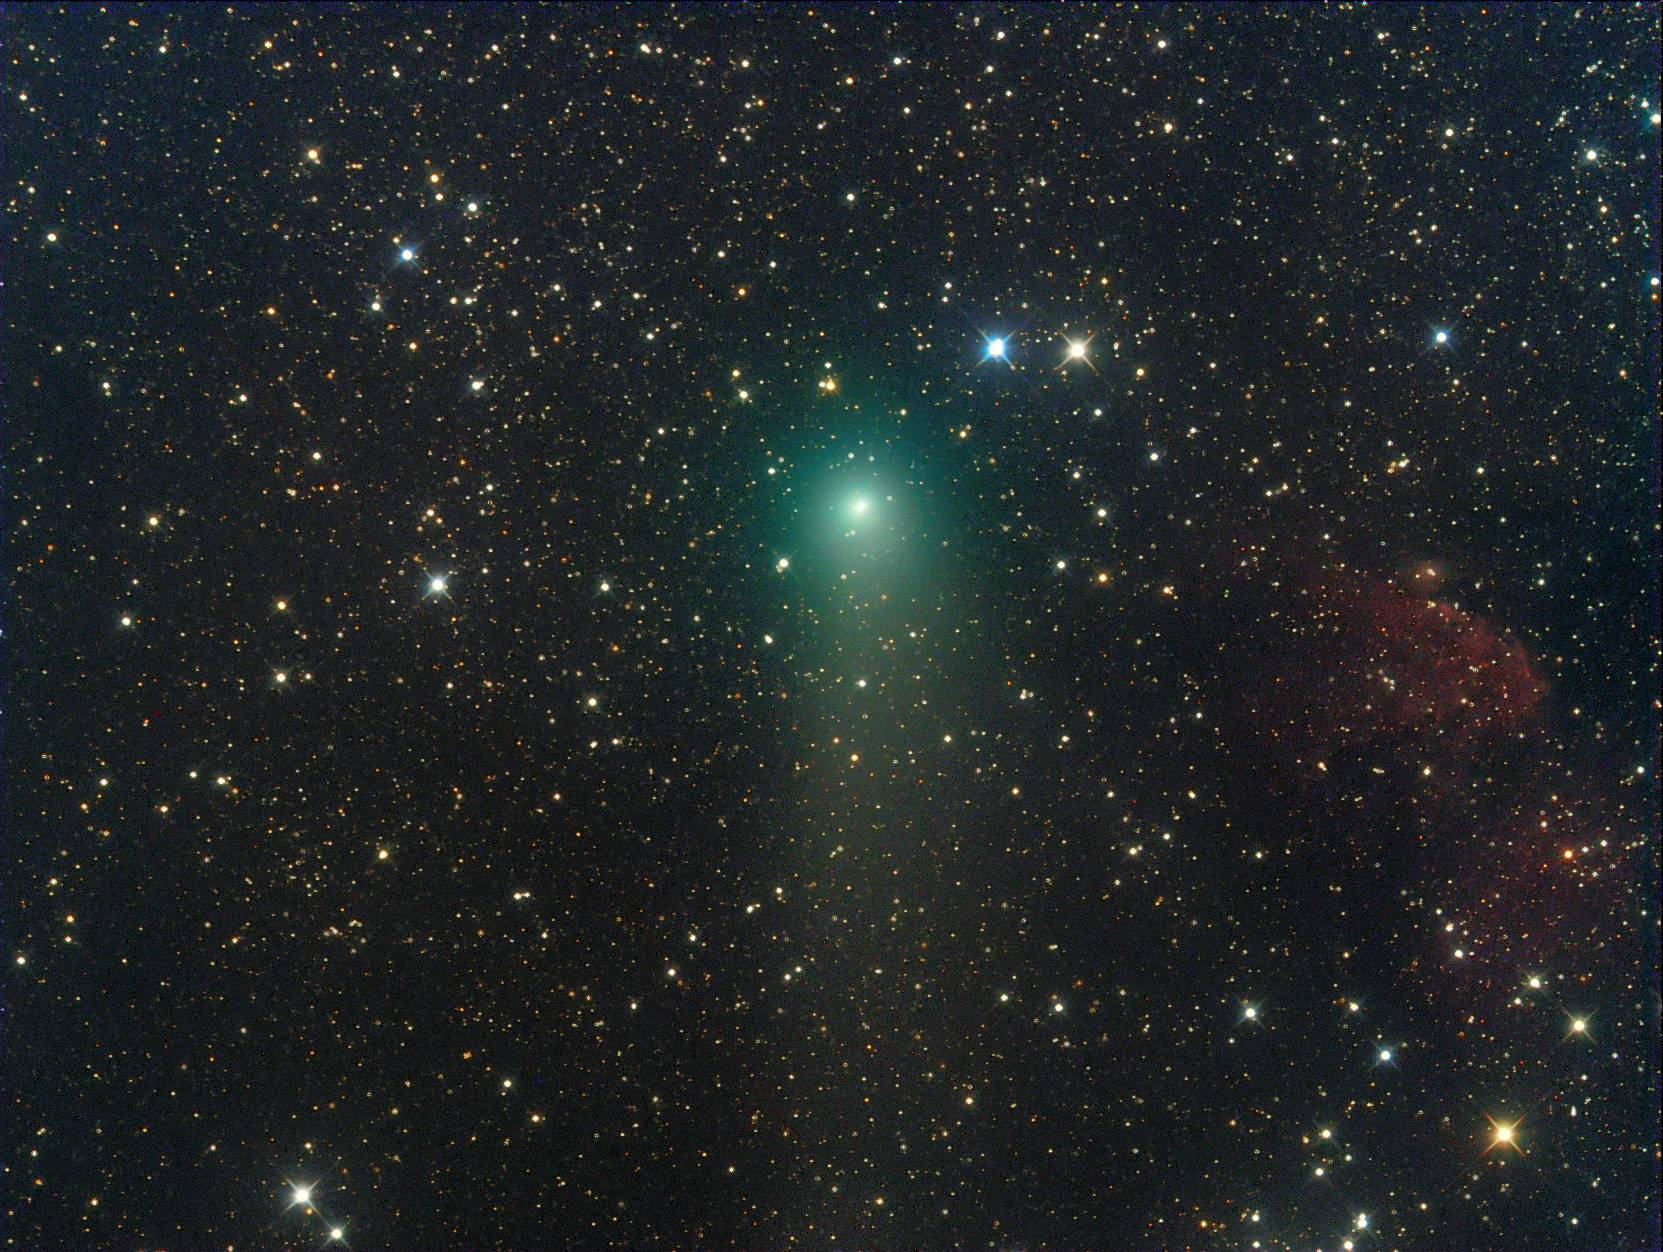 Imagen del cometa C/2012 F6 (Lemmon) obtenida el 9 de Julio de 2013 desde  Weißenkirchen, Wachau (Austria). Foto: Michael Jäger*